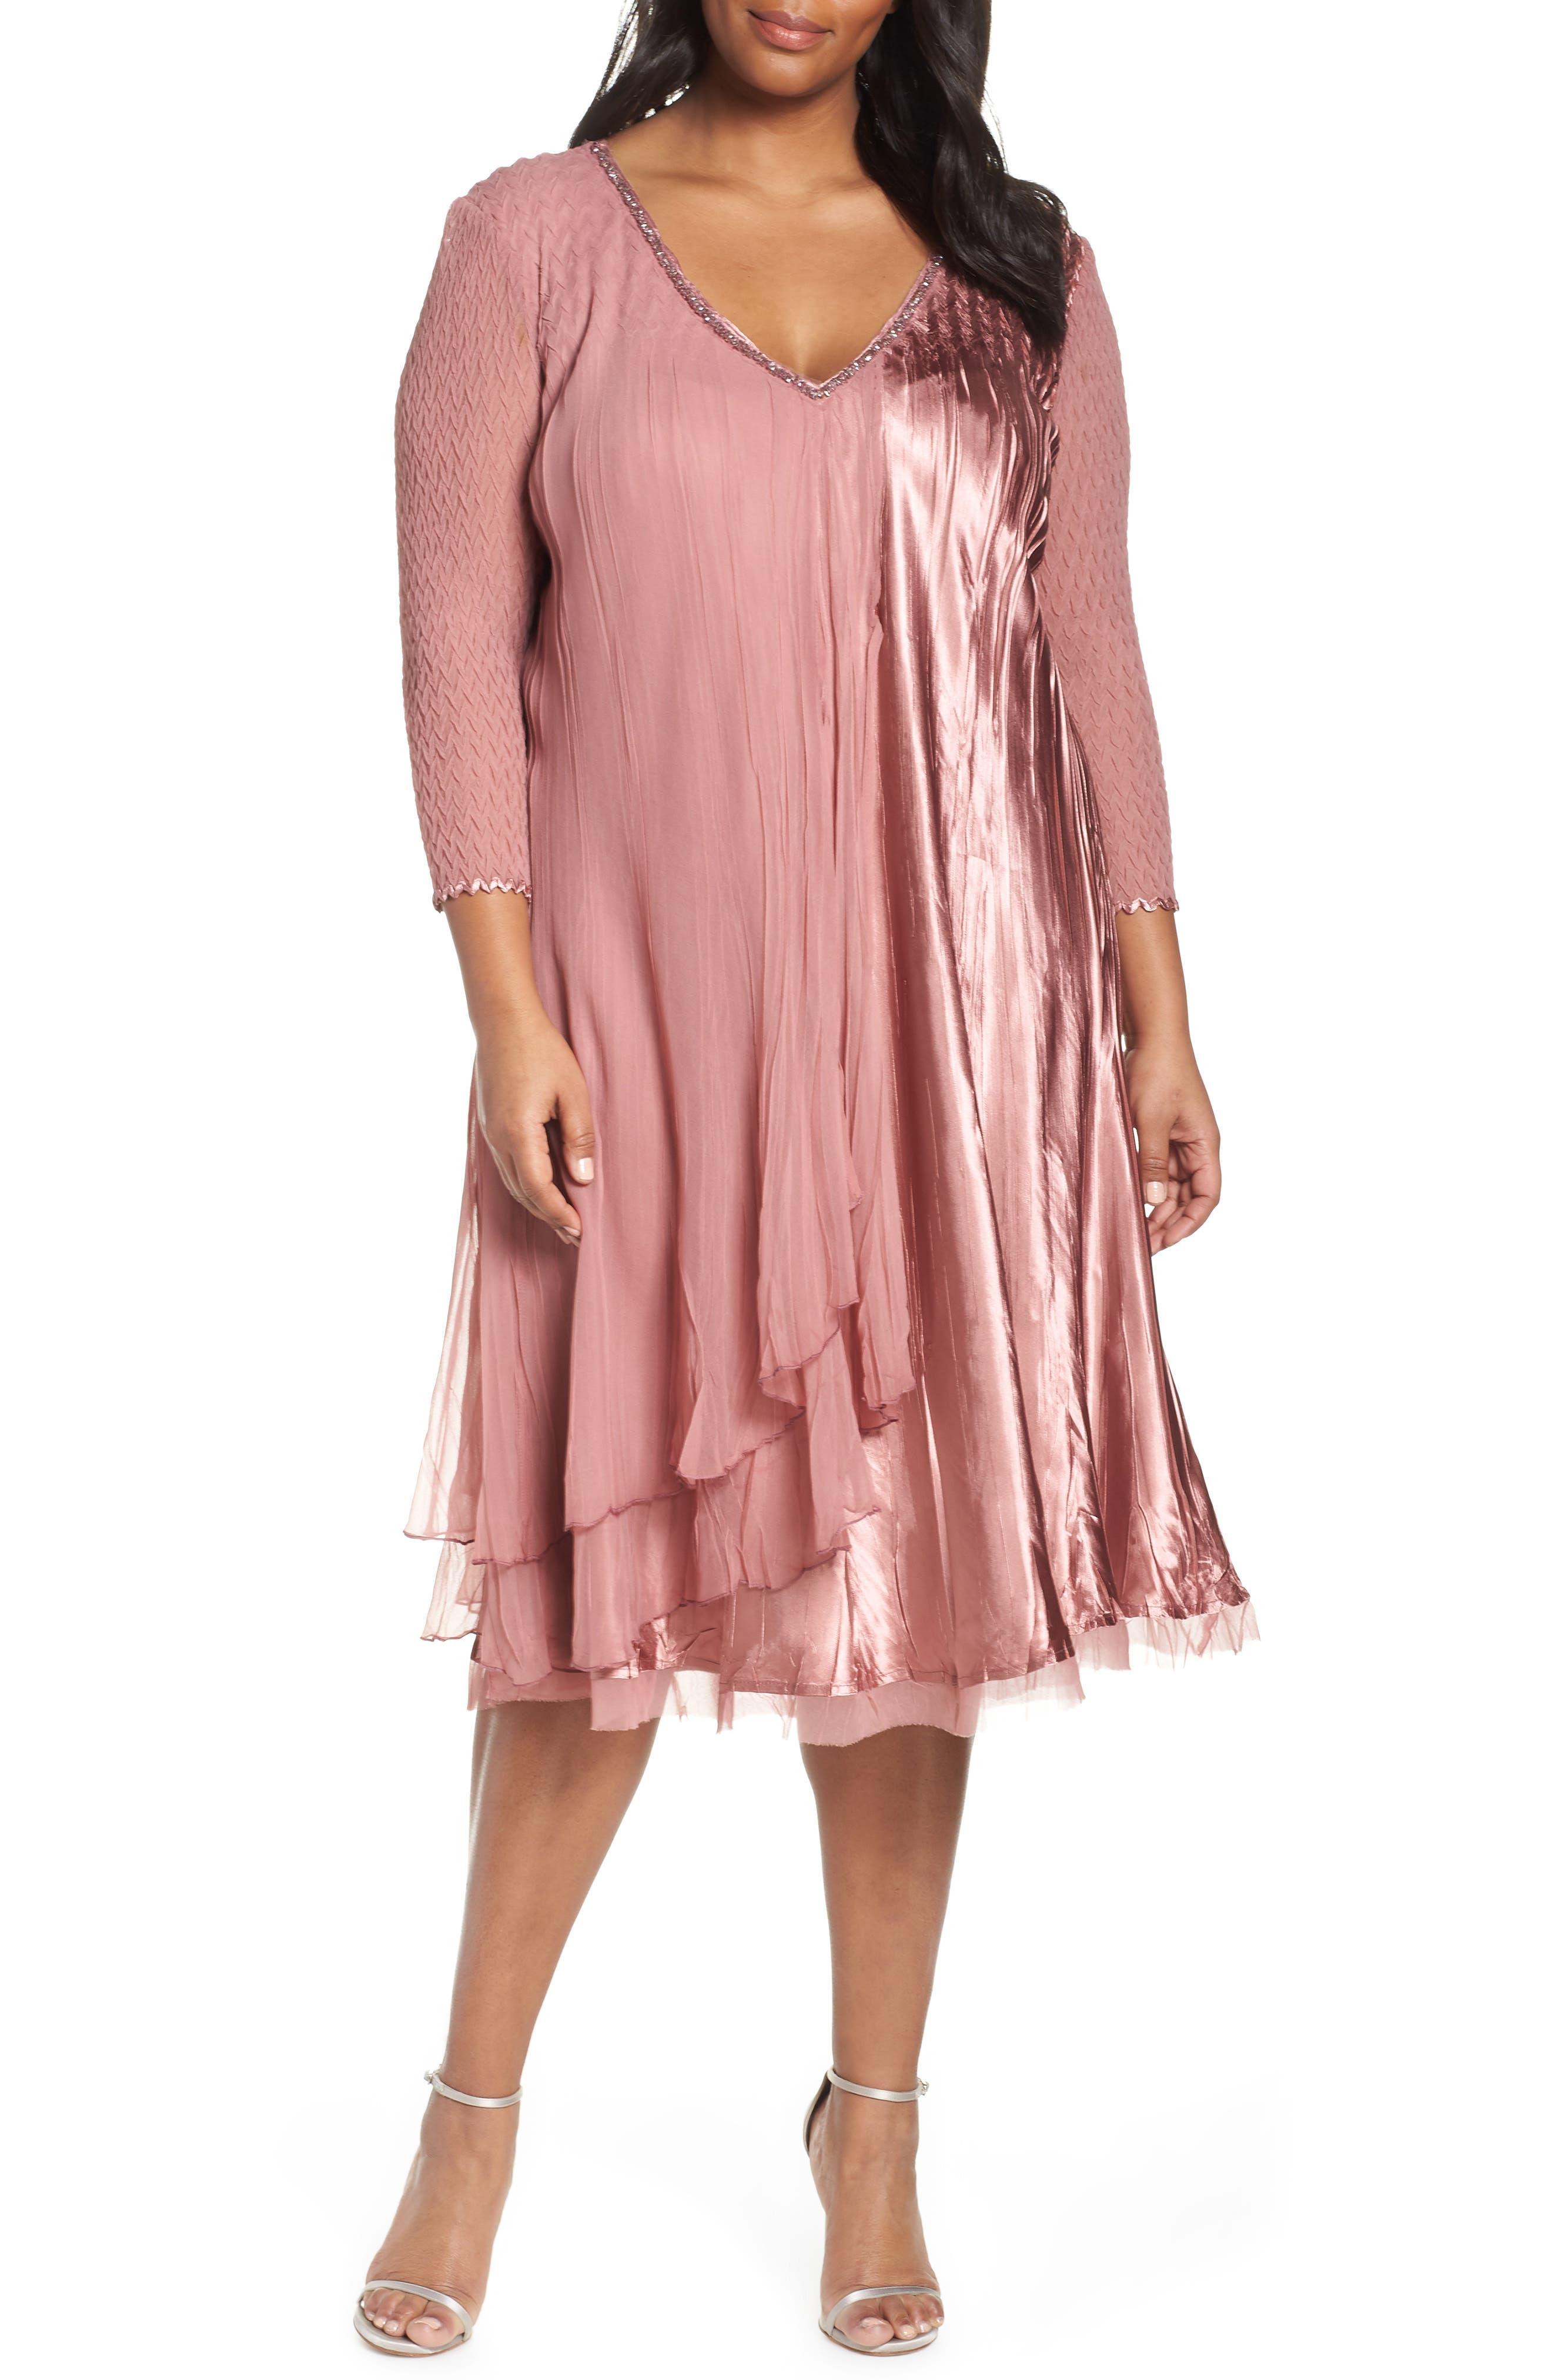 KOMAROV, Tiered A-Line Dress, Main thumbnail 1, color, 680